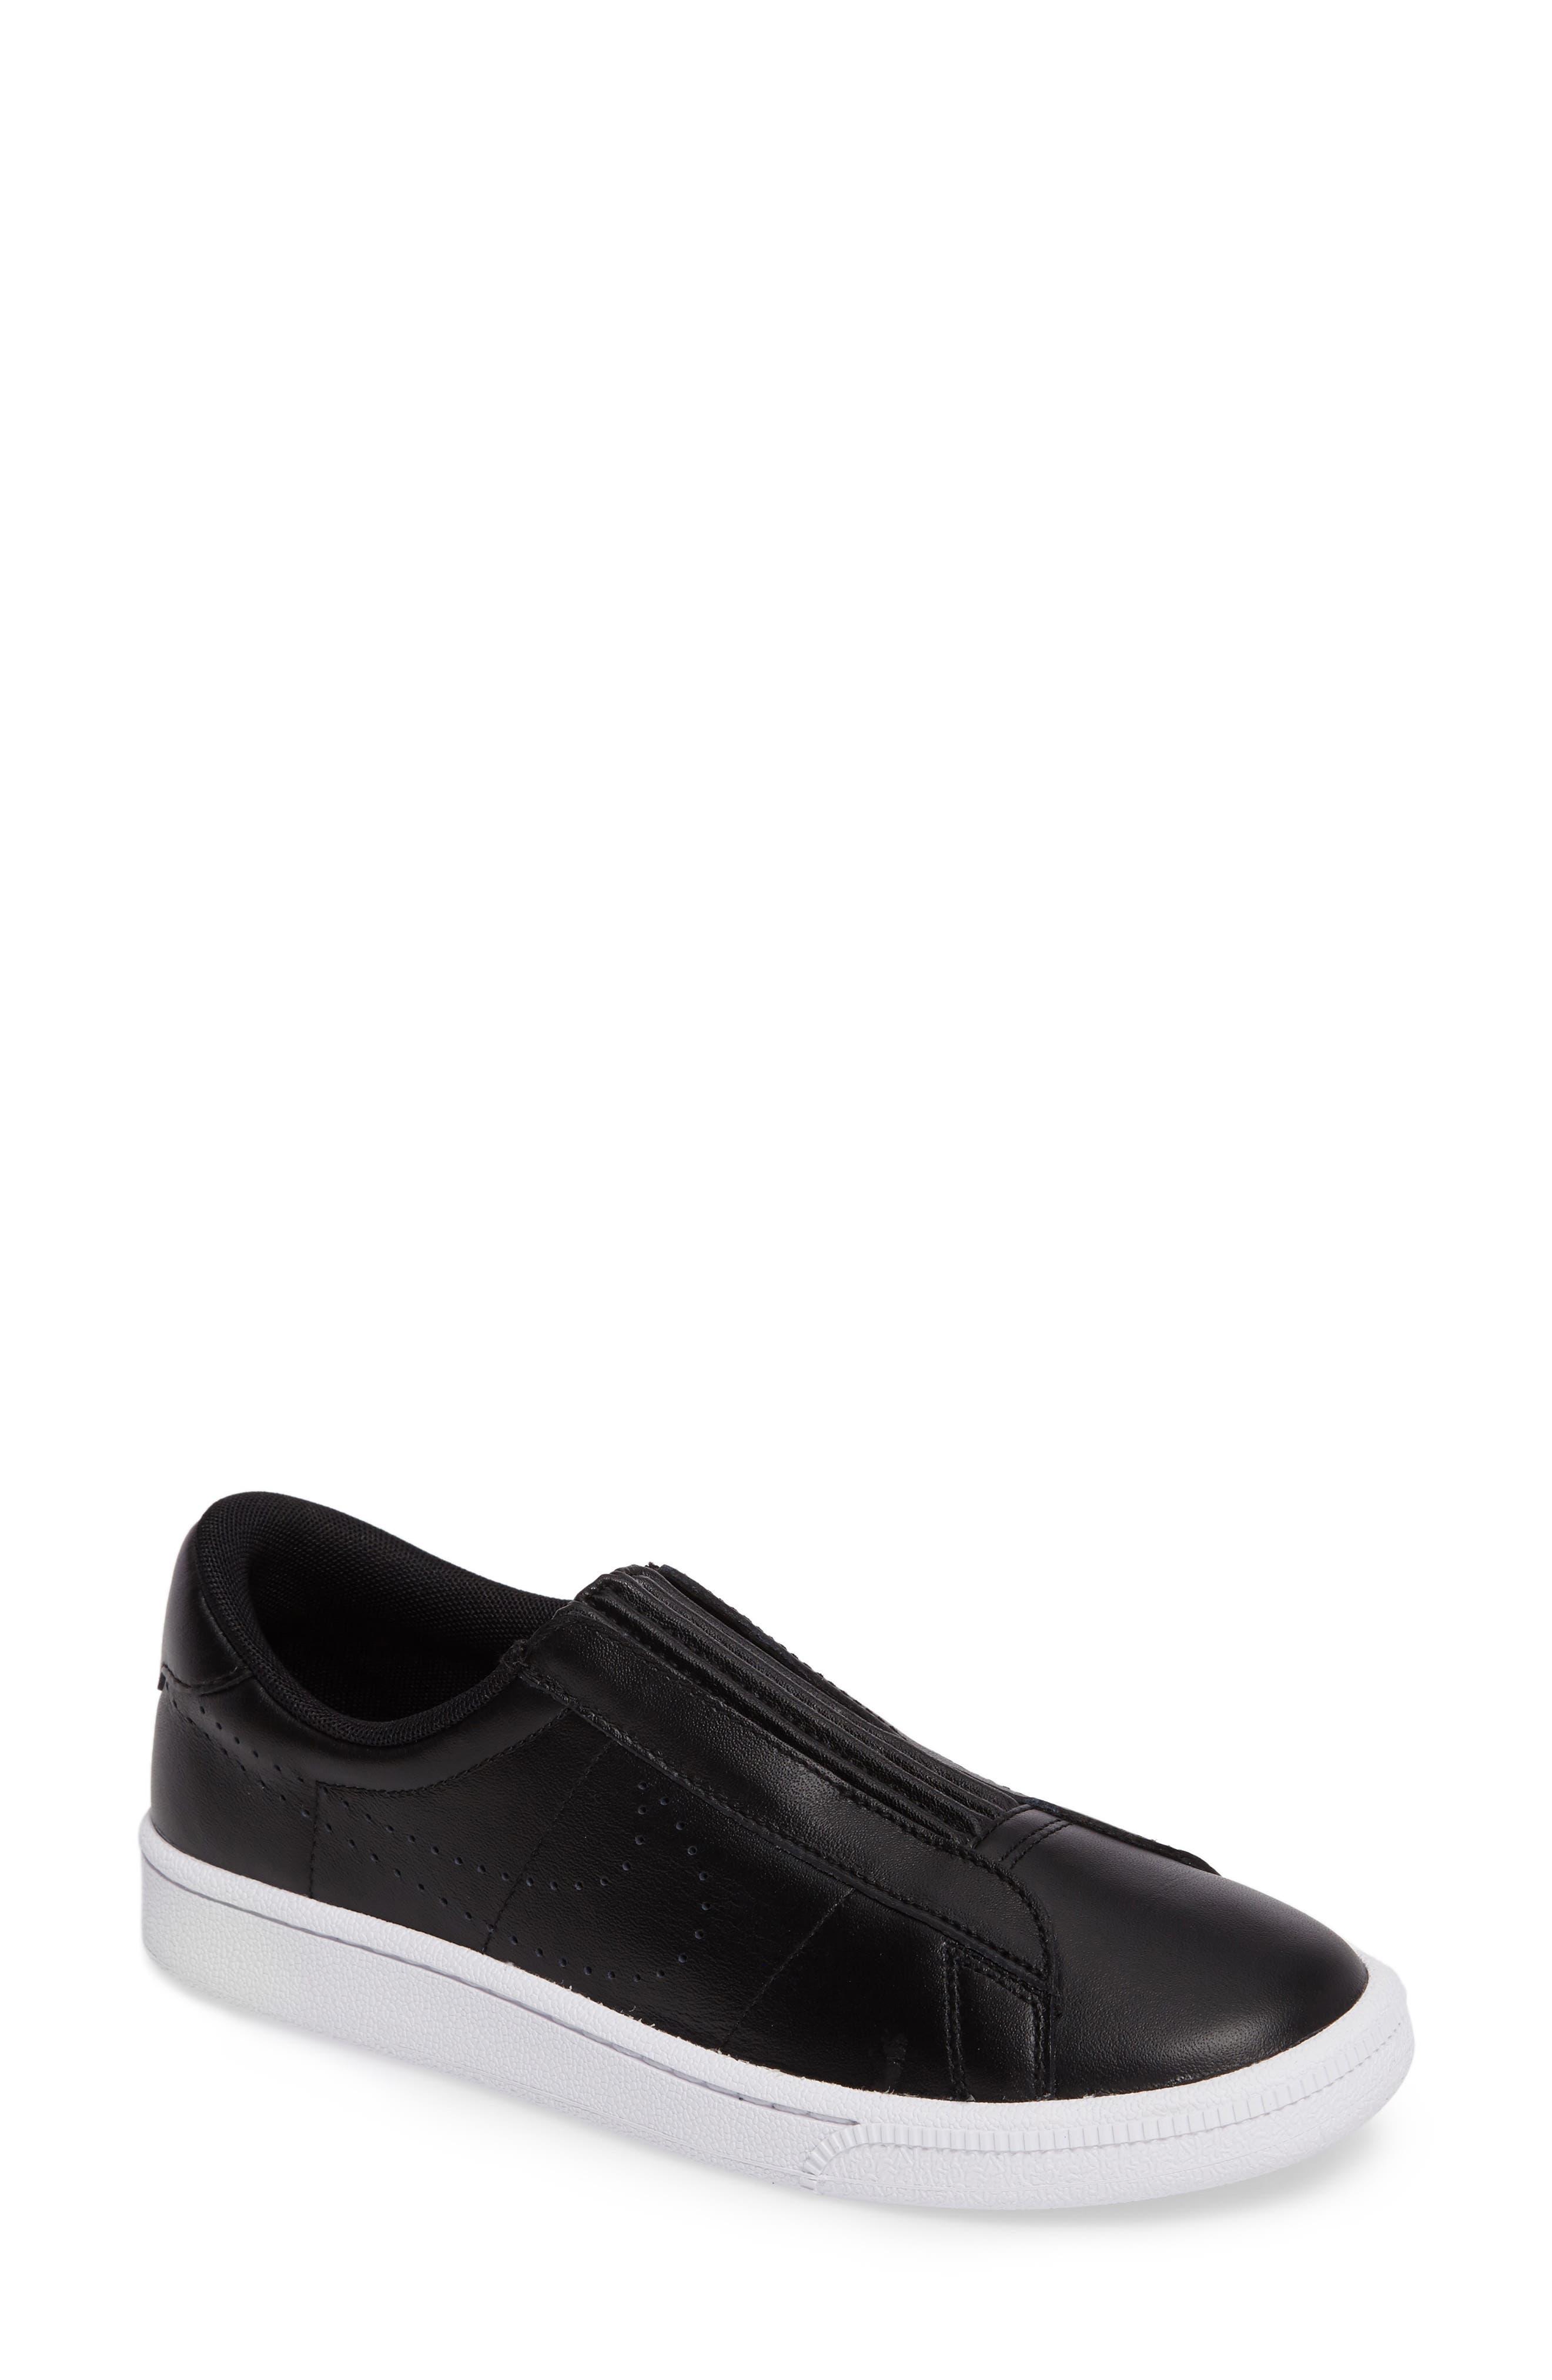 Alternate Image 1 Selected - Nike Classic EZ Slip-On Tennis Shoe (Women)